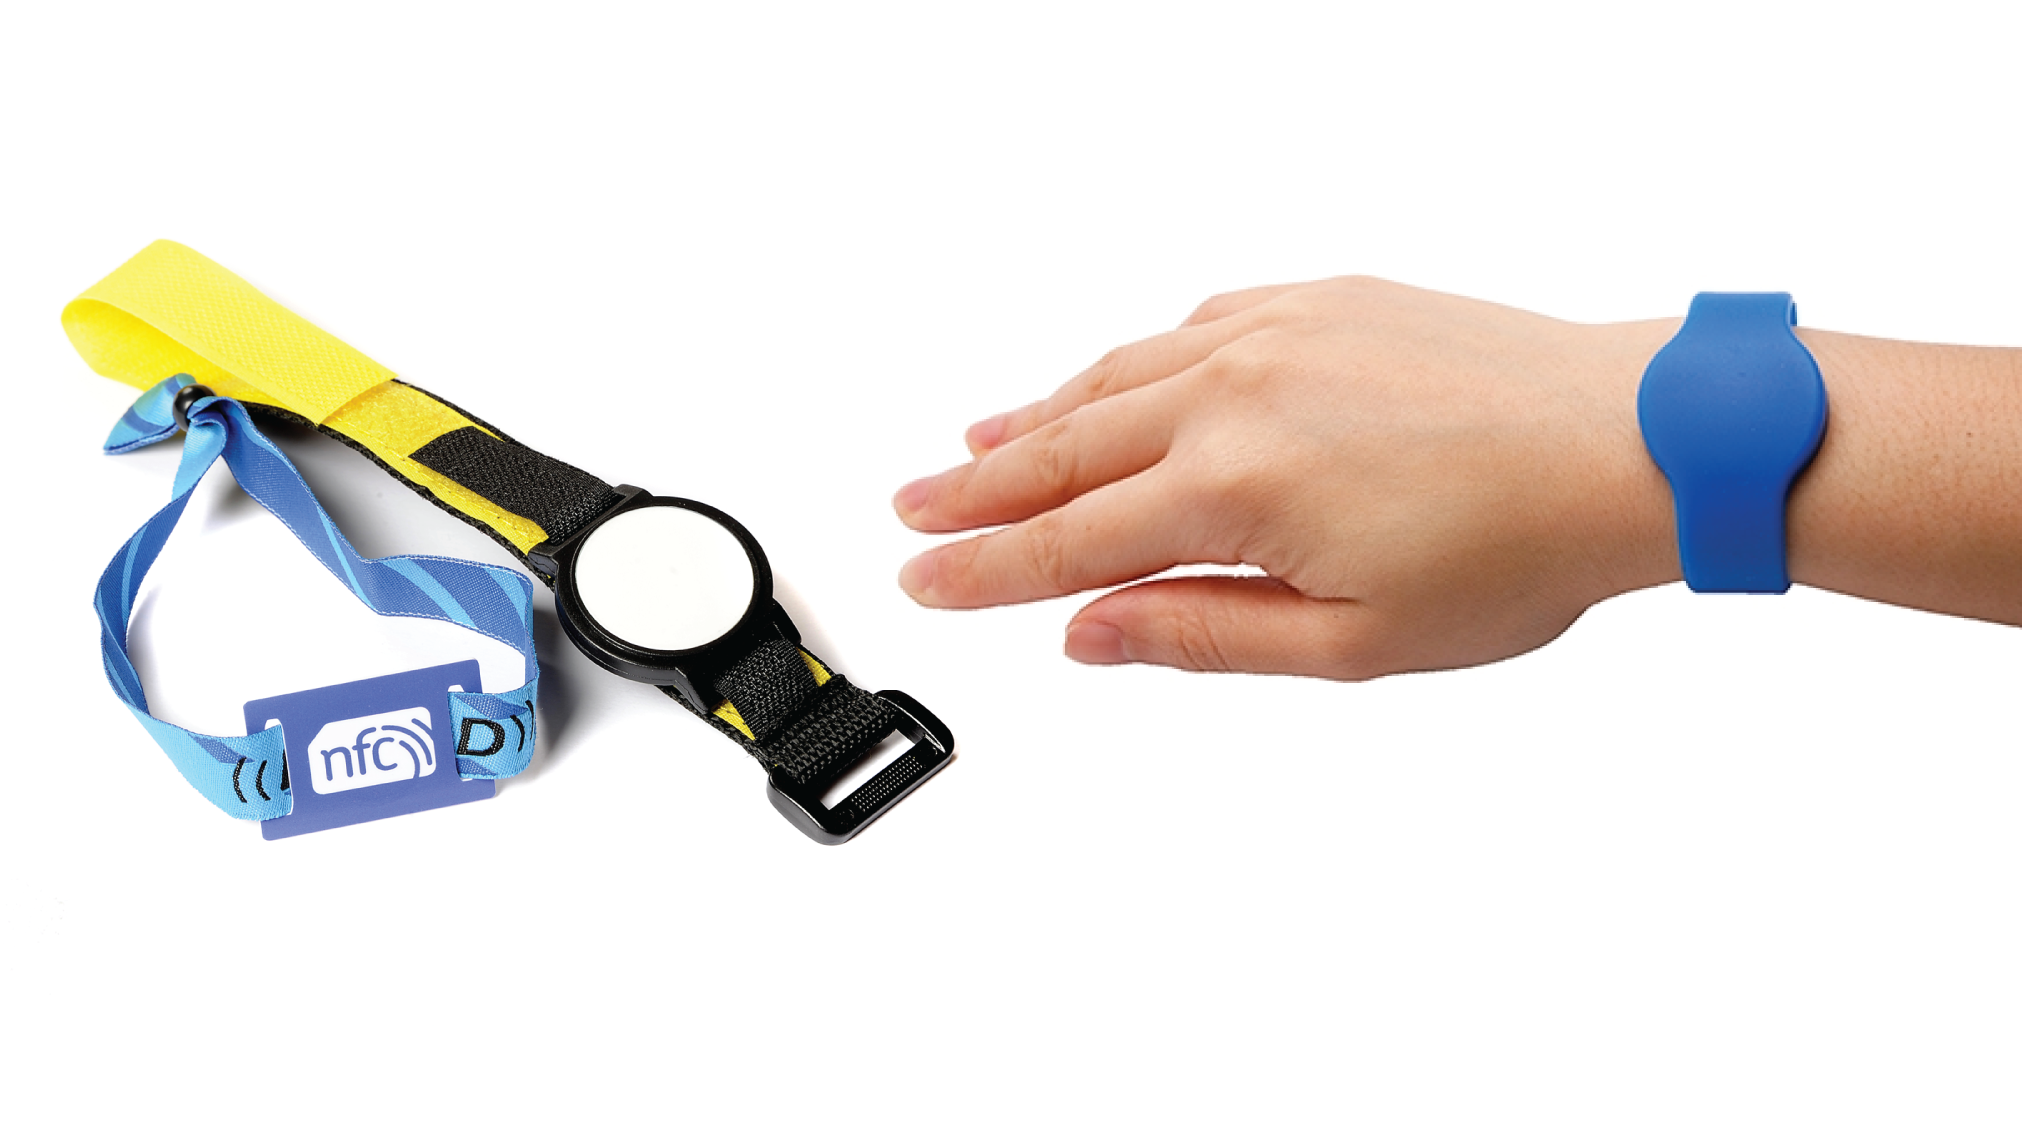 High Quality NFC Wristband in Bangladesh Call for Buy: 01611 75 87 ...